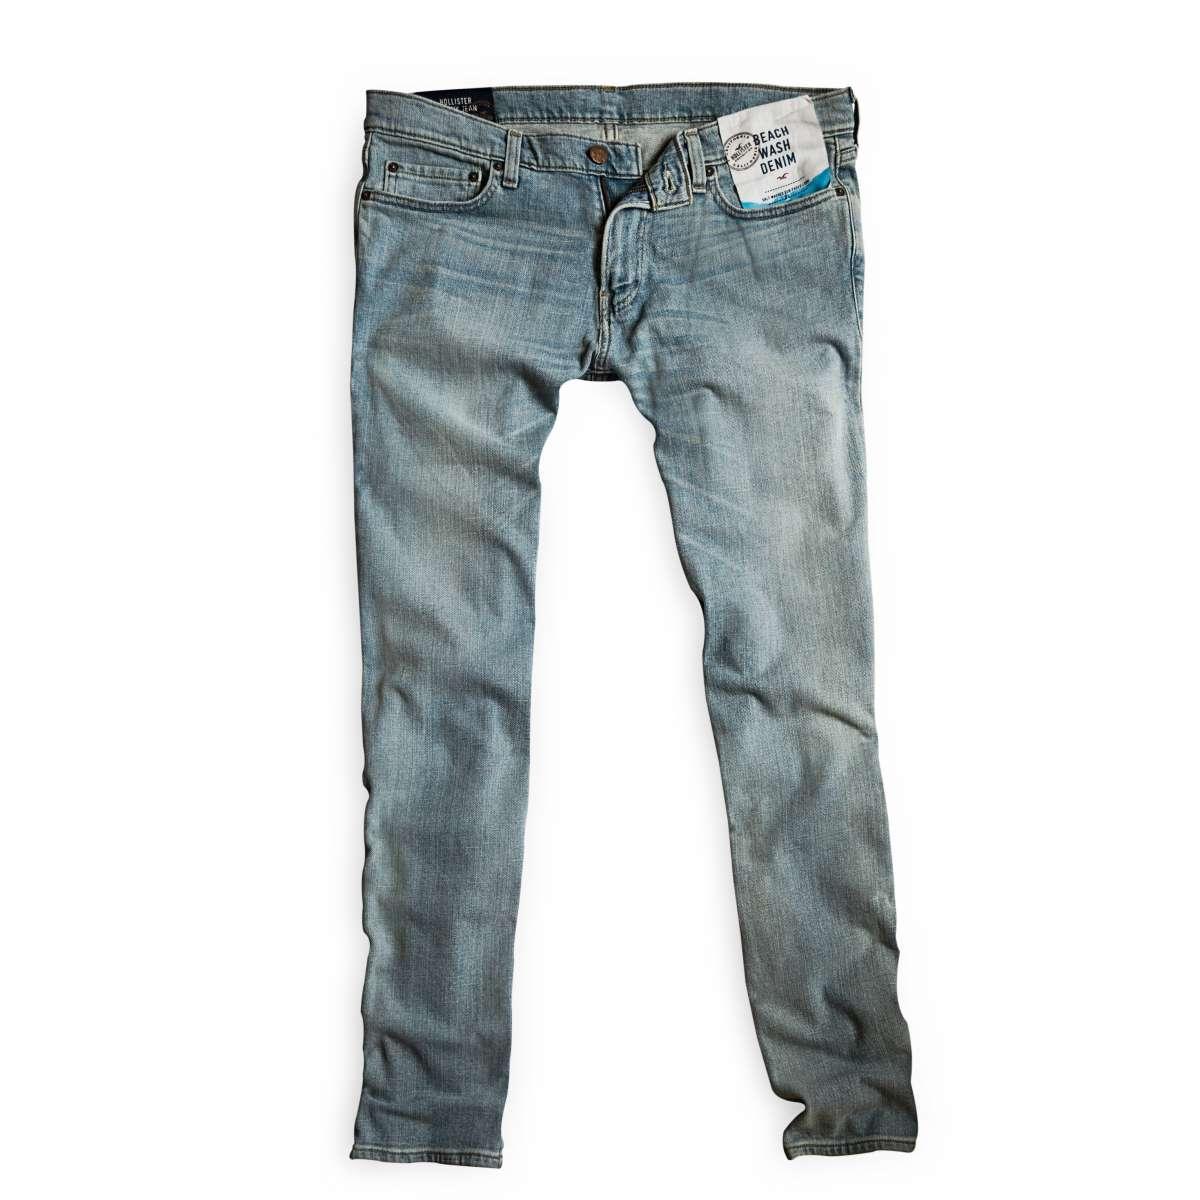 Hollister (джинсы)